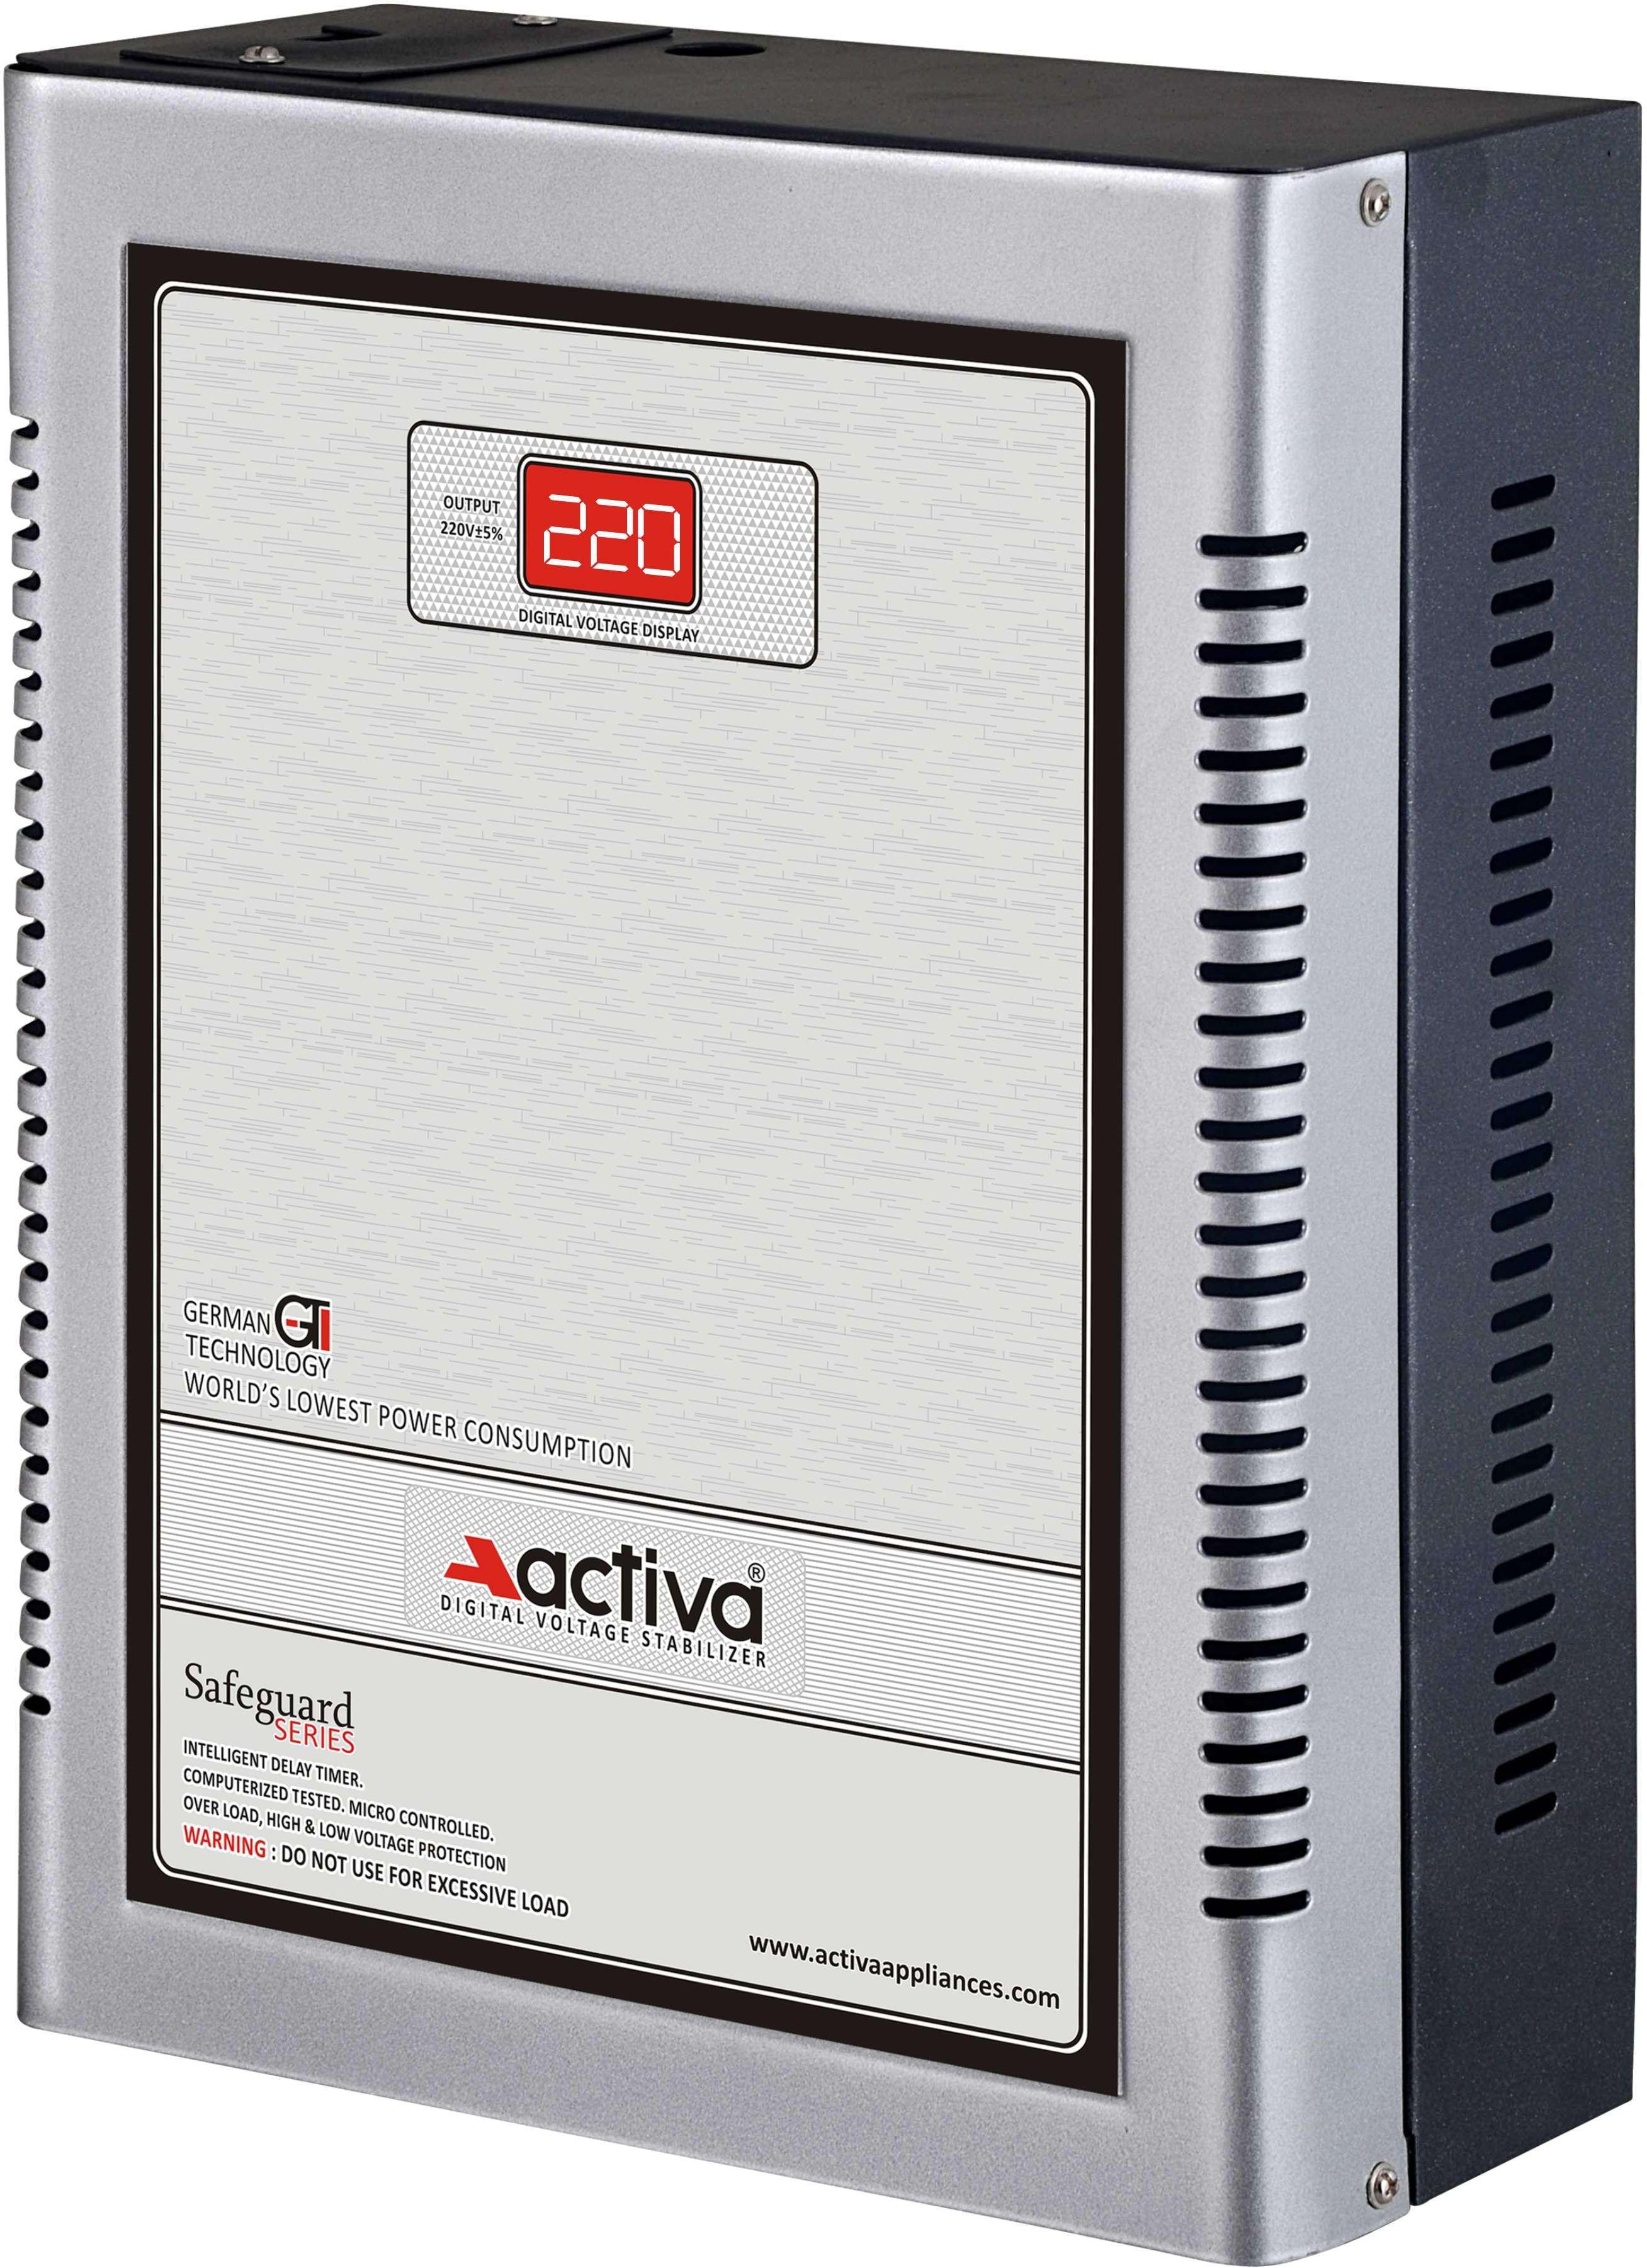 ACTIVA 4 KVA /140-300V DIGITAL AC VOLTAGE STABILIZER(SILVER-BLACK)